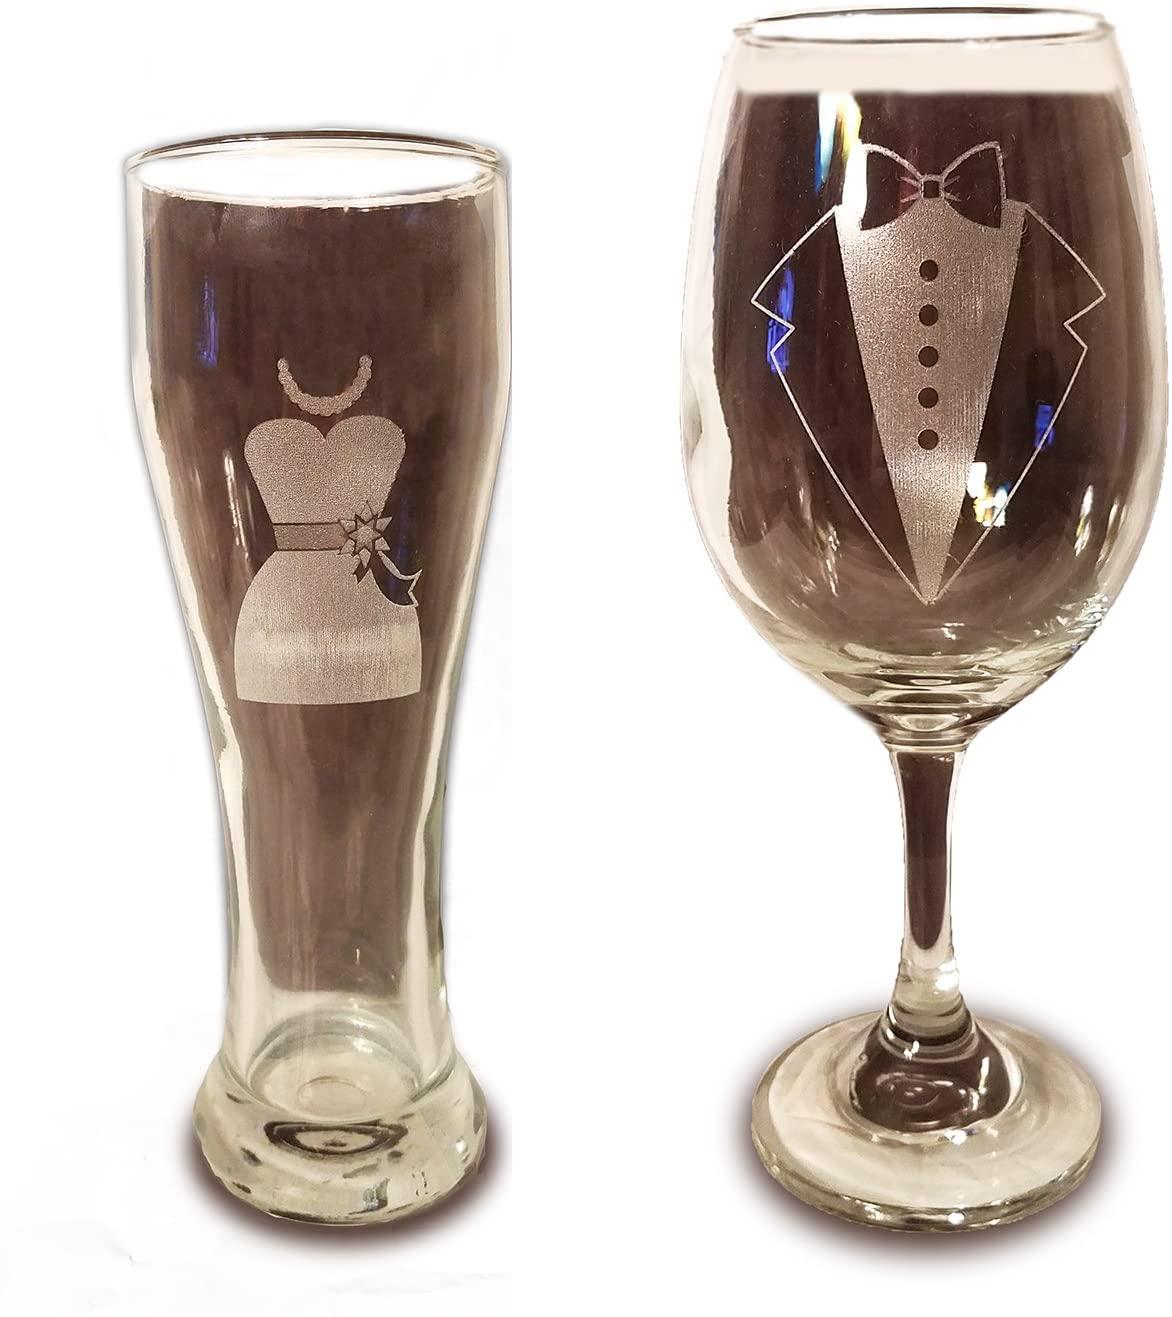 Laser Engraved Bride and Groom Glasses - 20 oz Wine Glass and 15 oz Beer Pilsner Glass - Wedding Toasting Set of 2 - Couples Gifts - Engagement Gift - Original Wedding Gifts - Custom Wedding